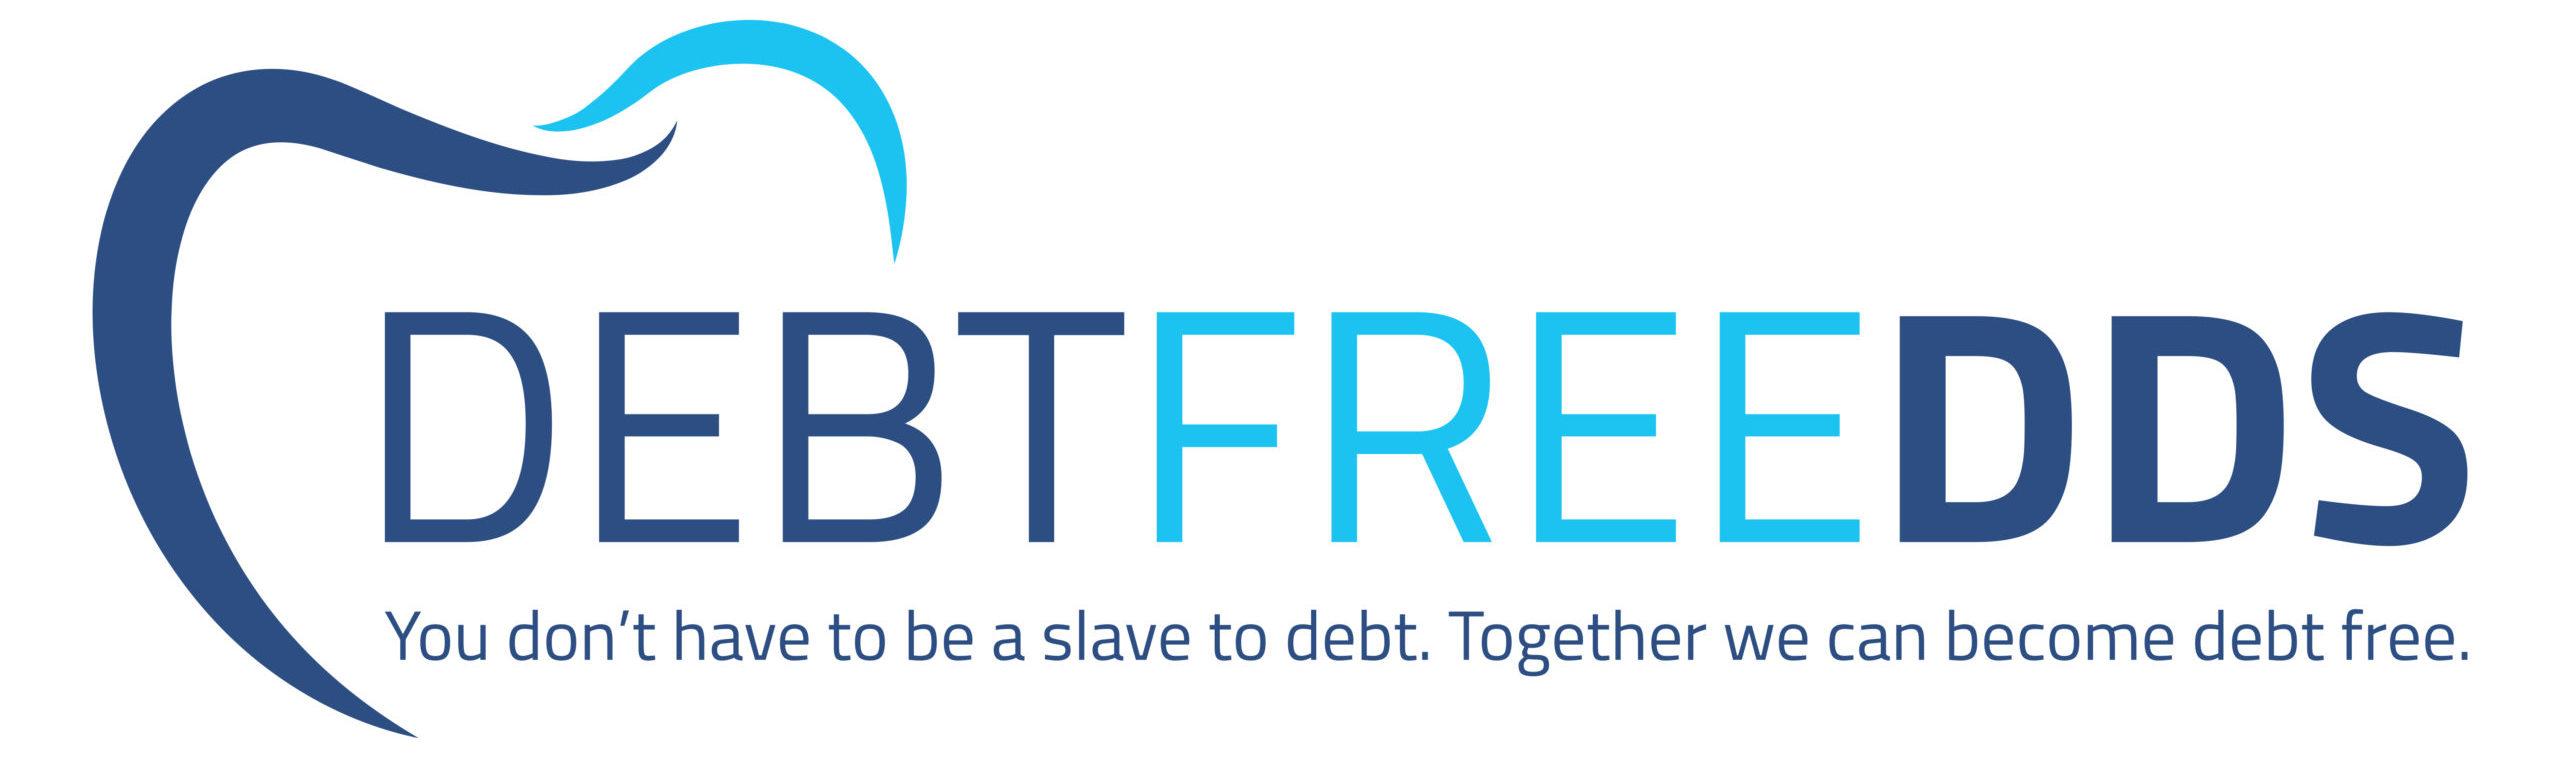 Debt Free DDS